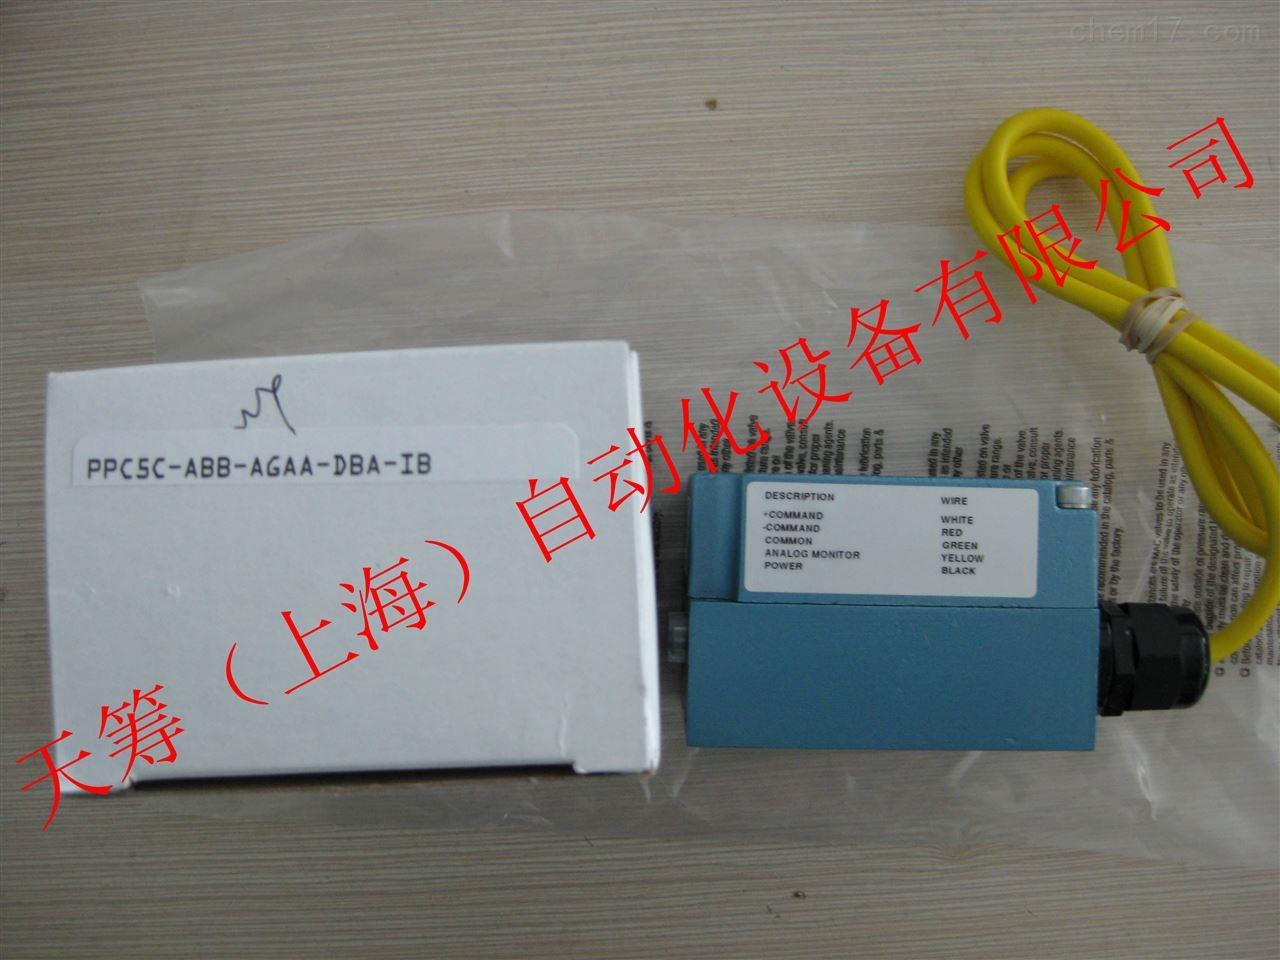 MAC电磁阀PPC5C-ABB-AGAA-DBA-IB美国原装